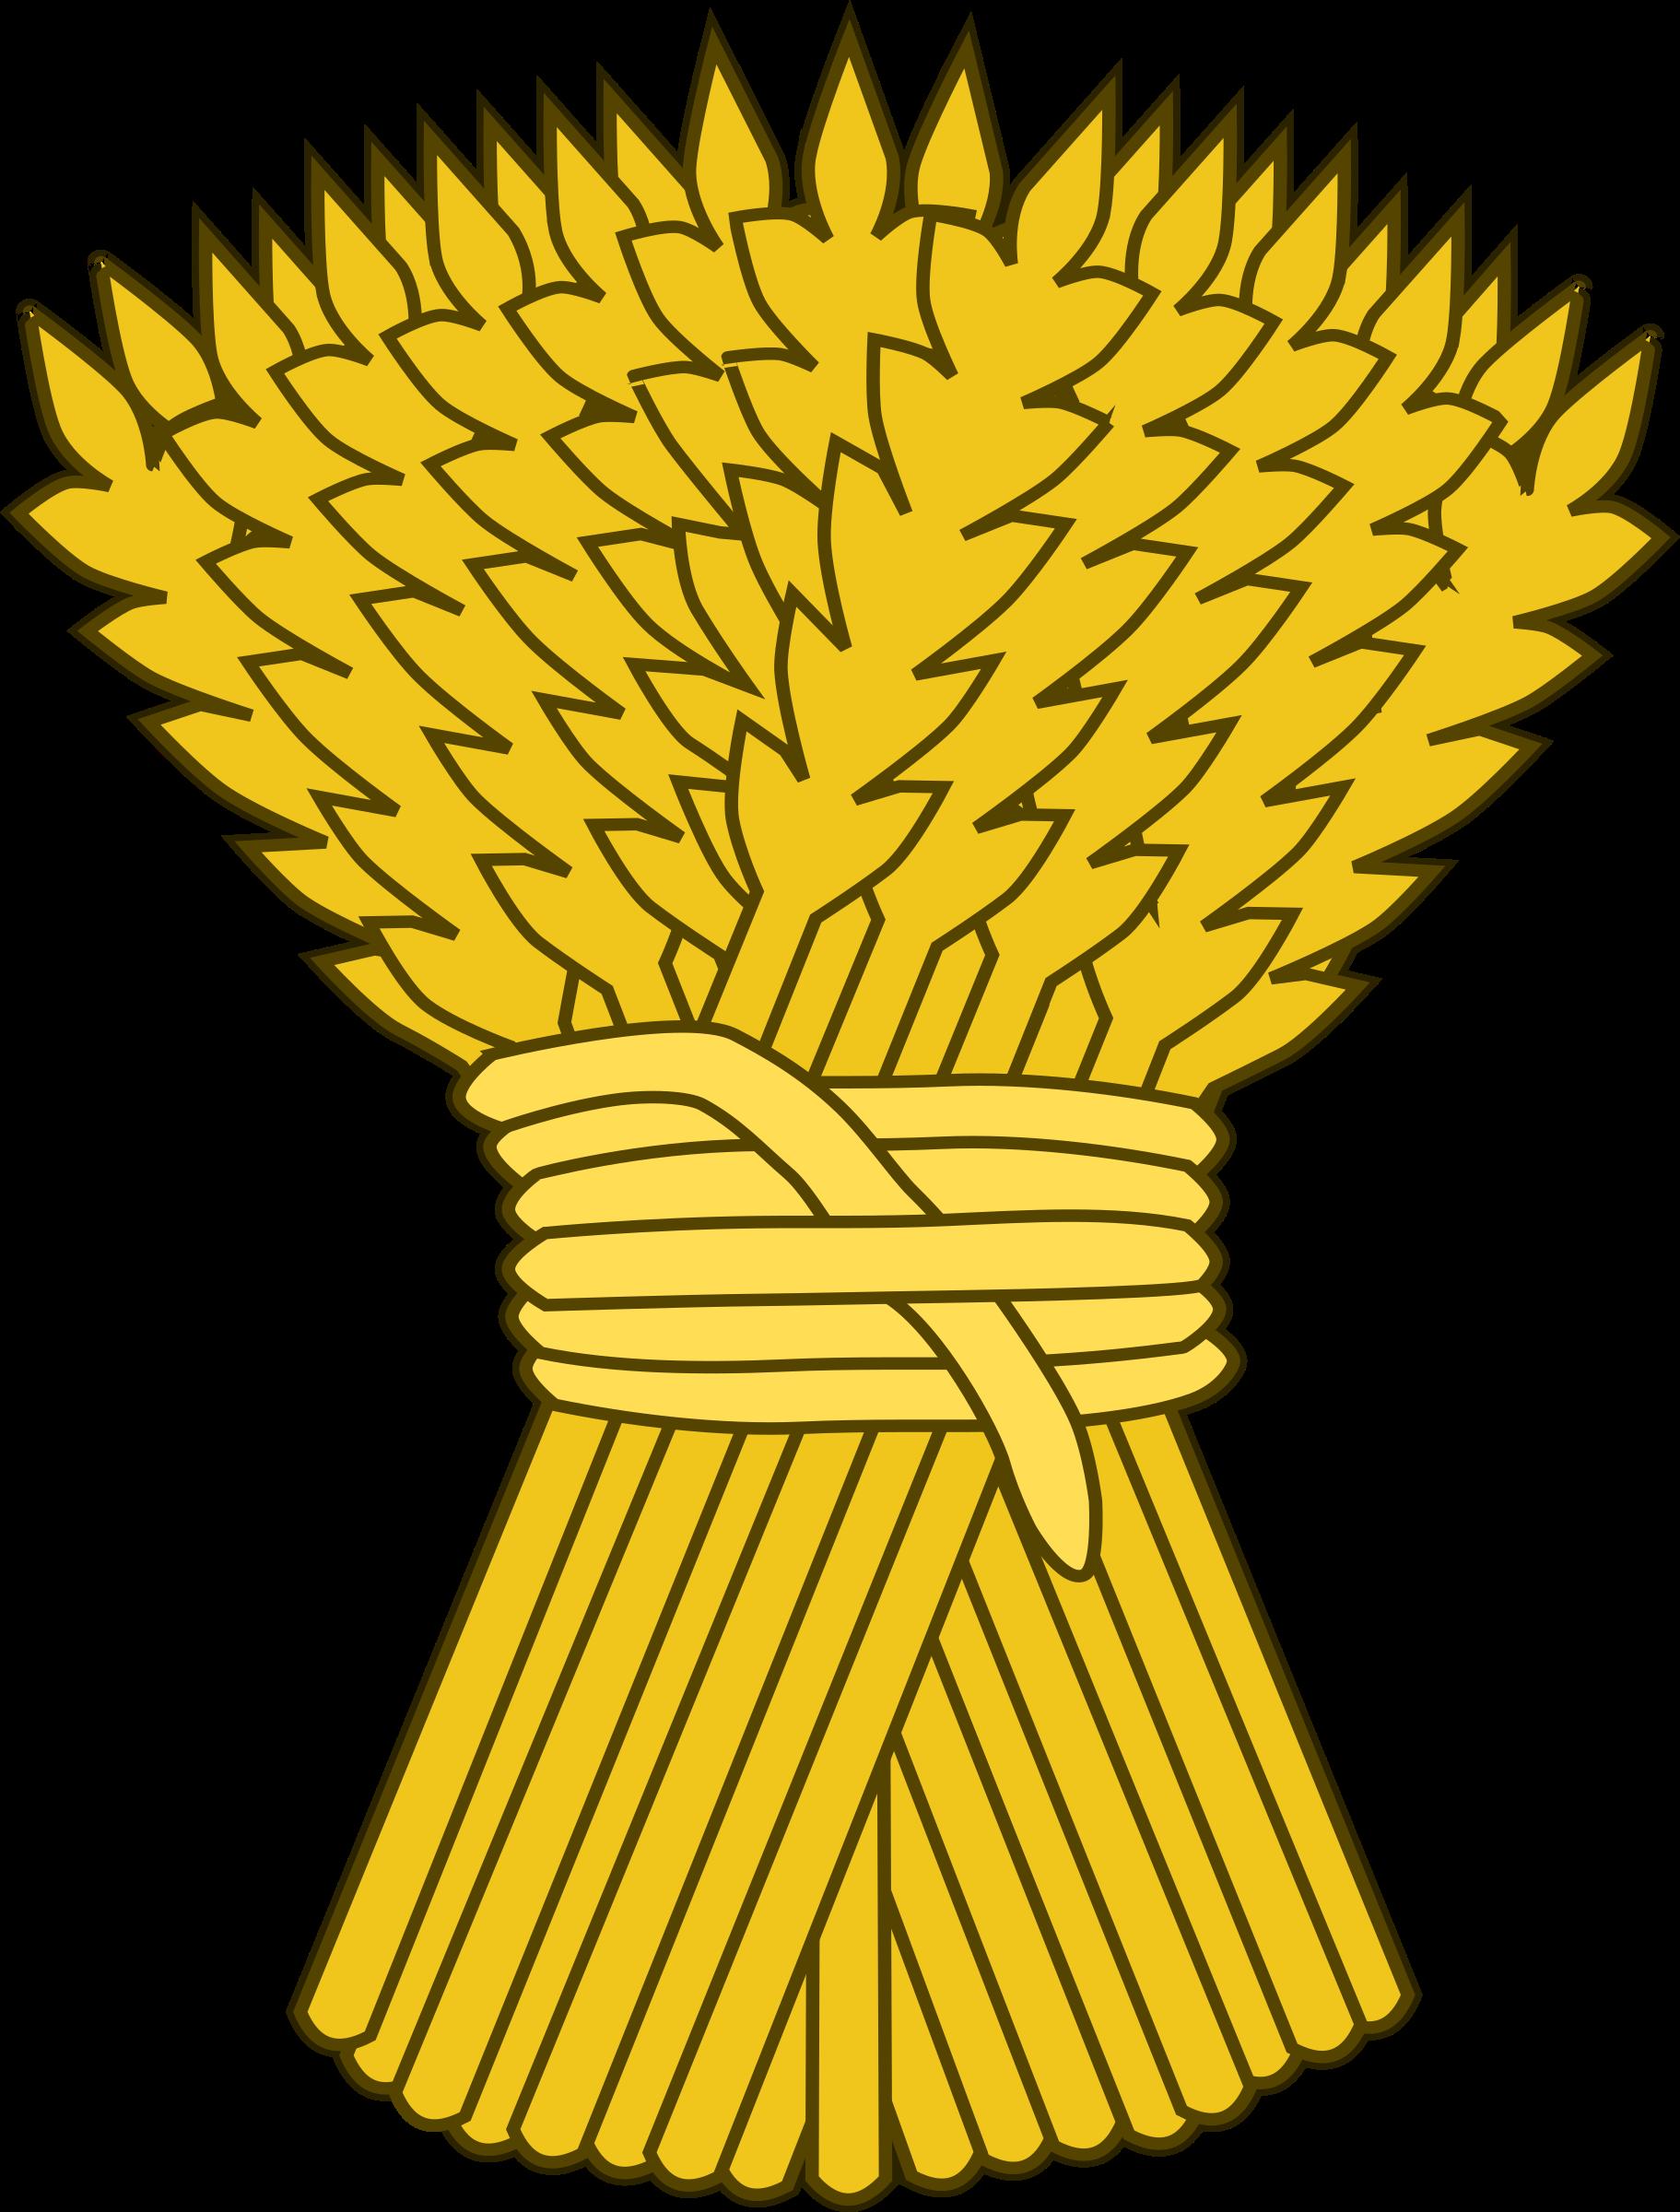 Drawn wheat Sheaf Wheat Wheat Clipart sheaf